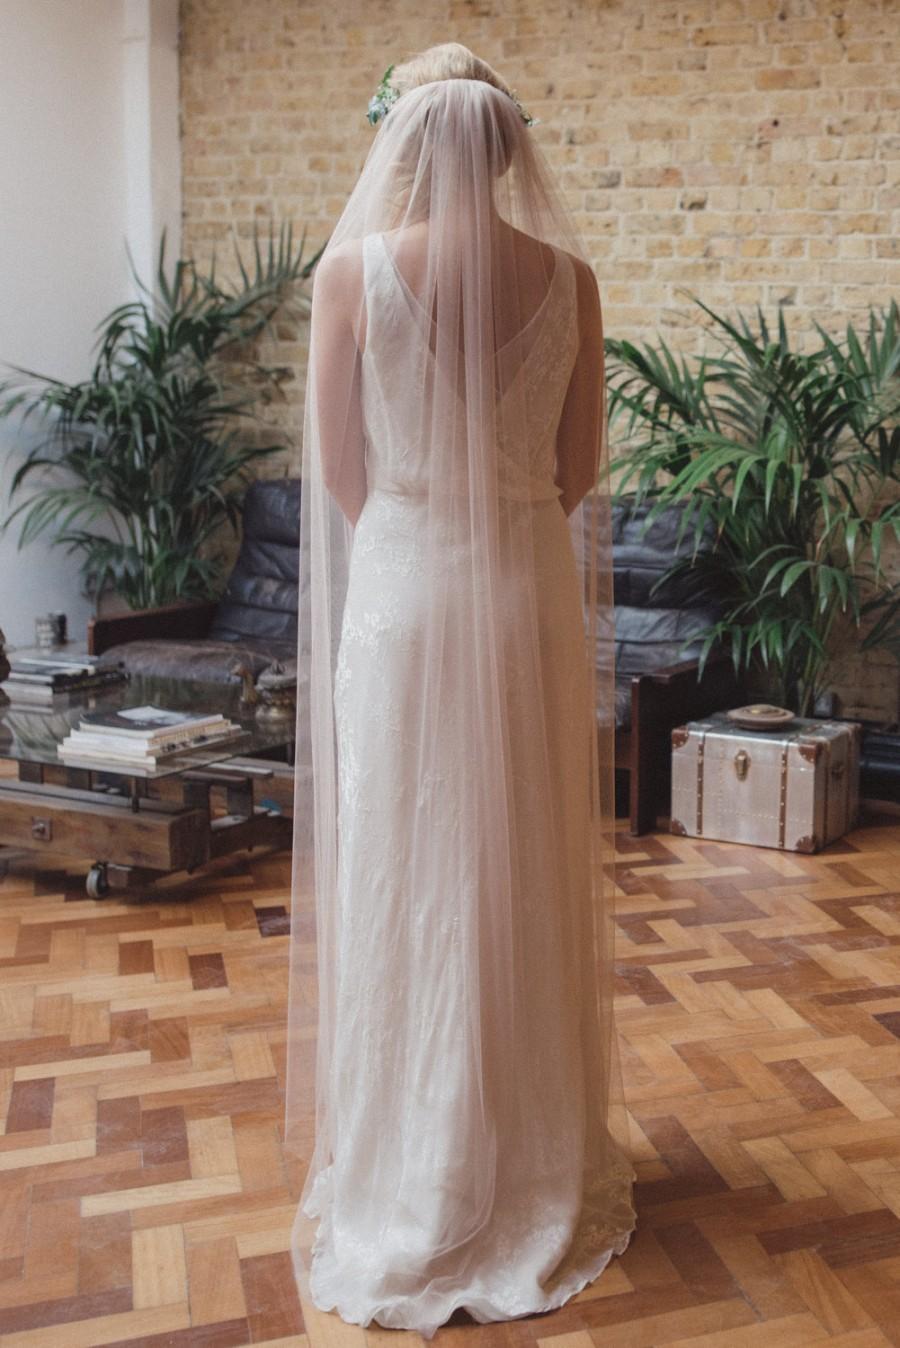 Mariage - Soft single tier veil, simple veil, silk-style veil, cut edge veil, medium width, elbow, waist, fingertip, waltz, chapel, cathedral length